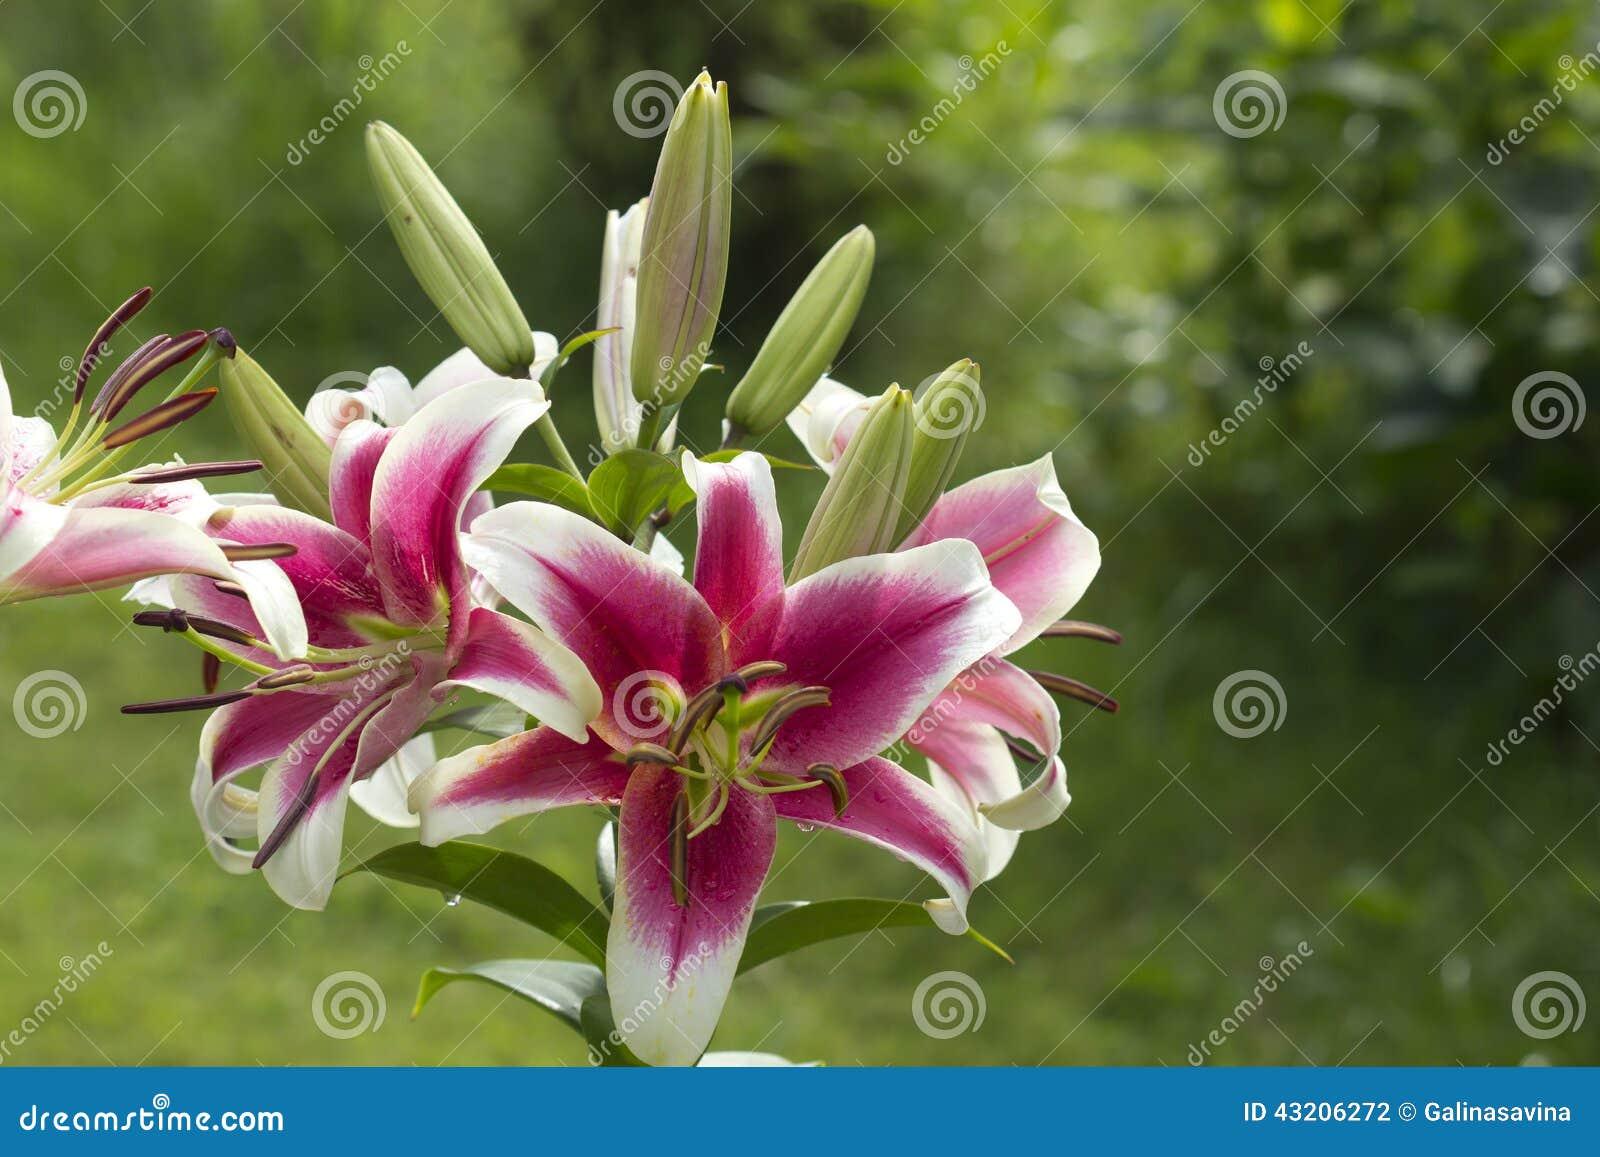 Download Lilja - prinsessaflora arkivfoto. Bild av blomma, design - 43206272